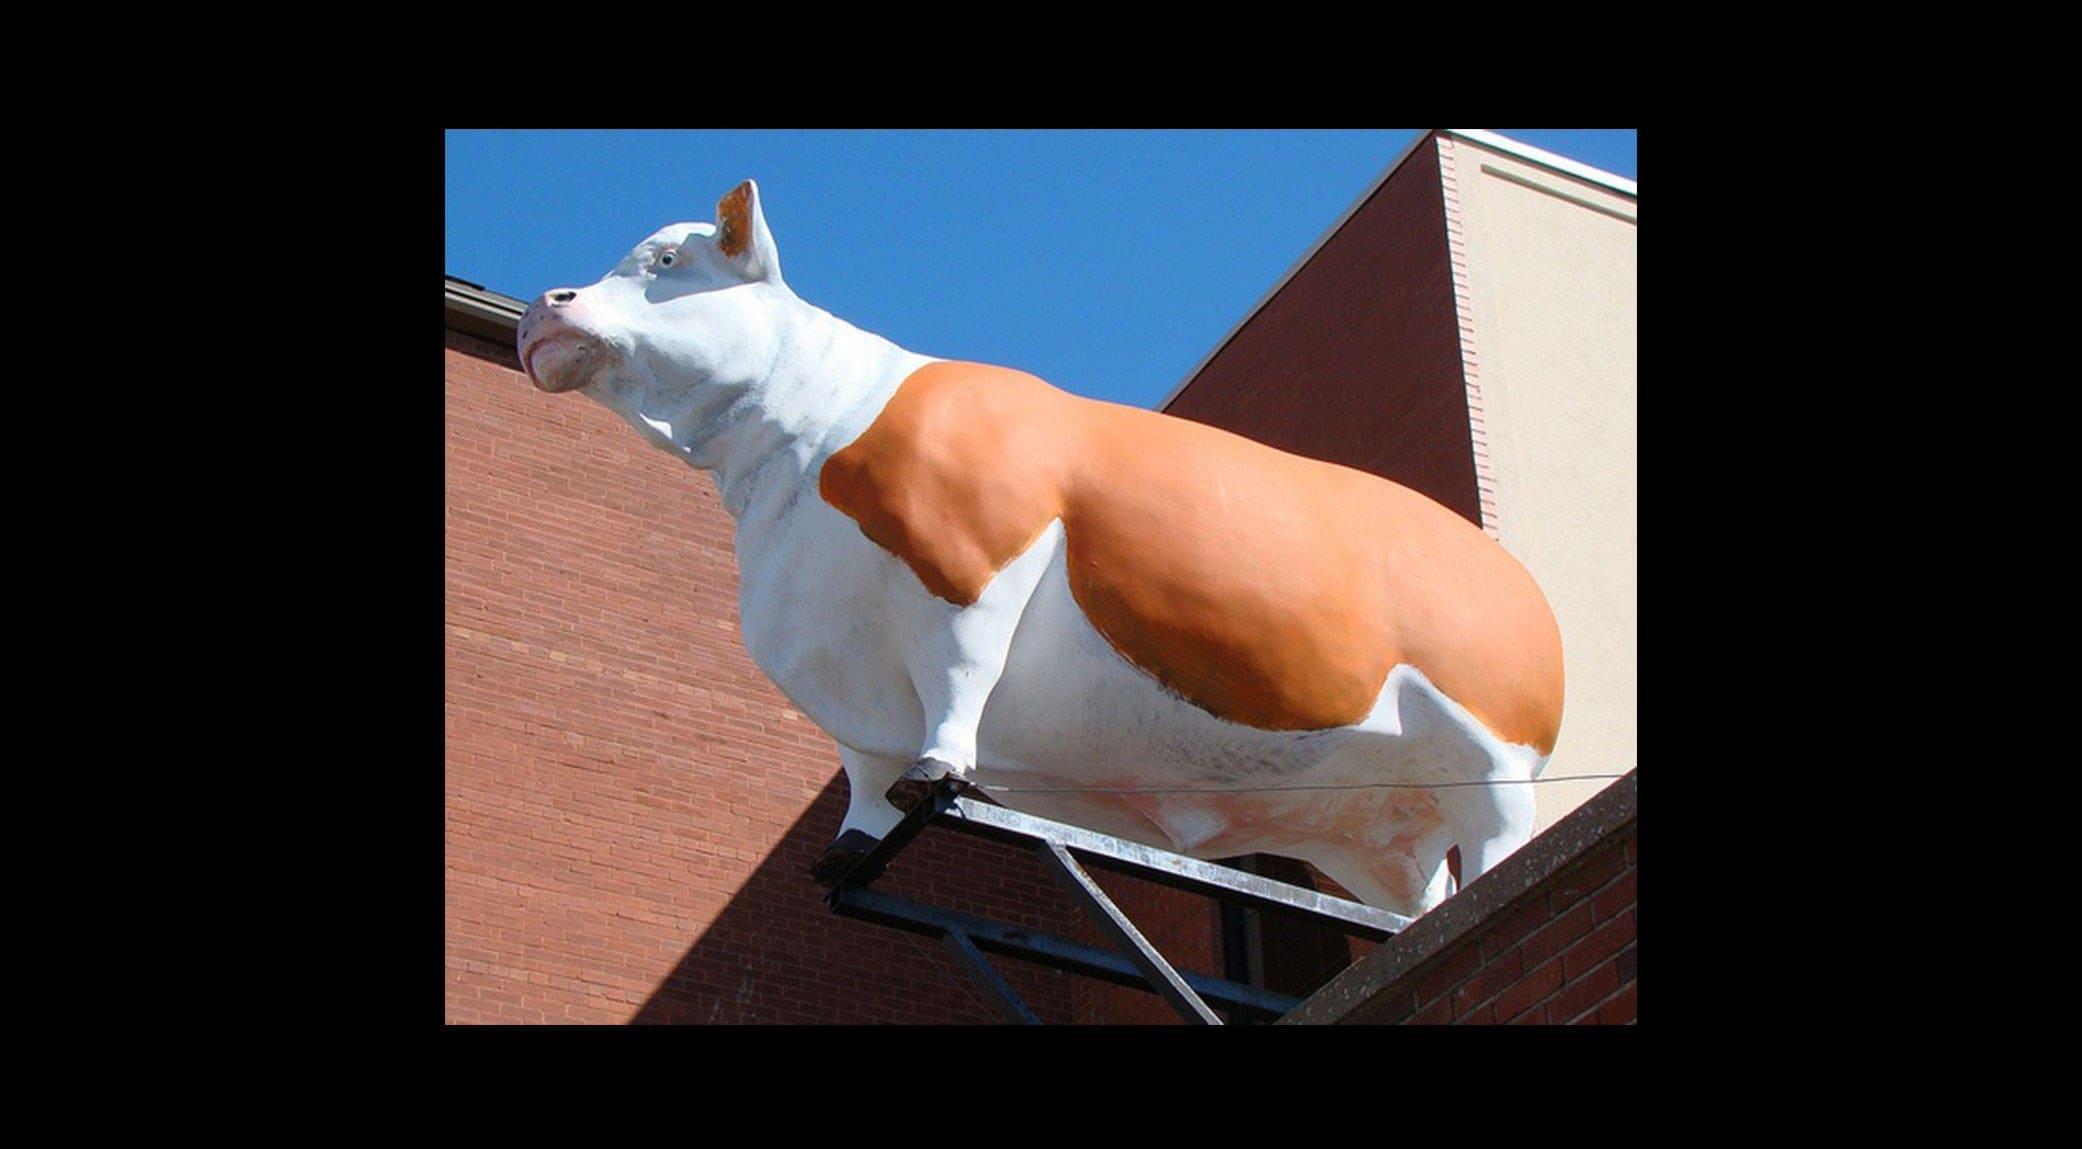 original_007-COW-finedininglovers.jpg